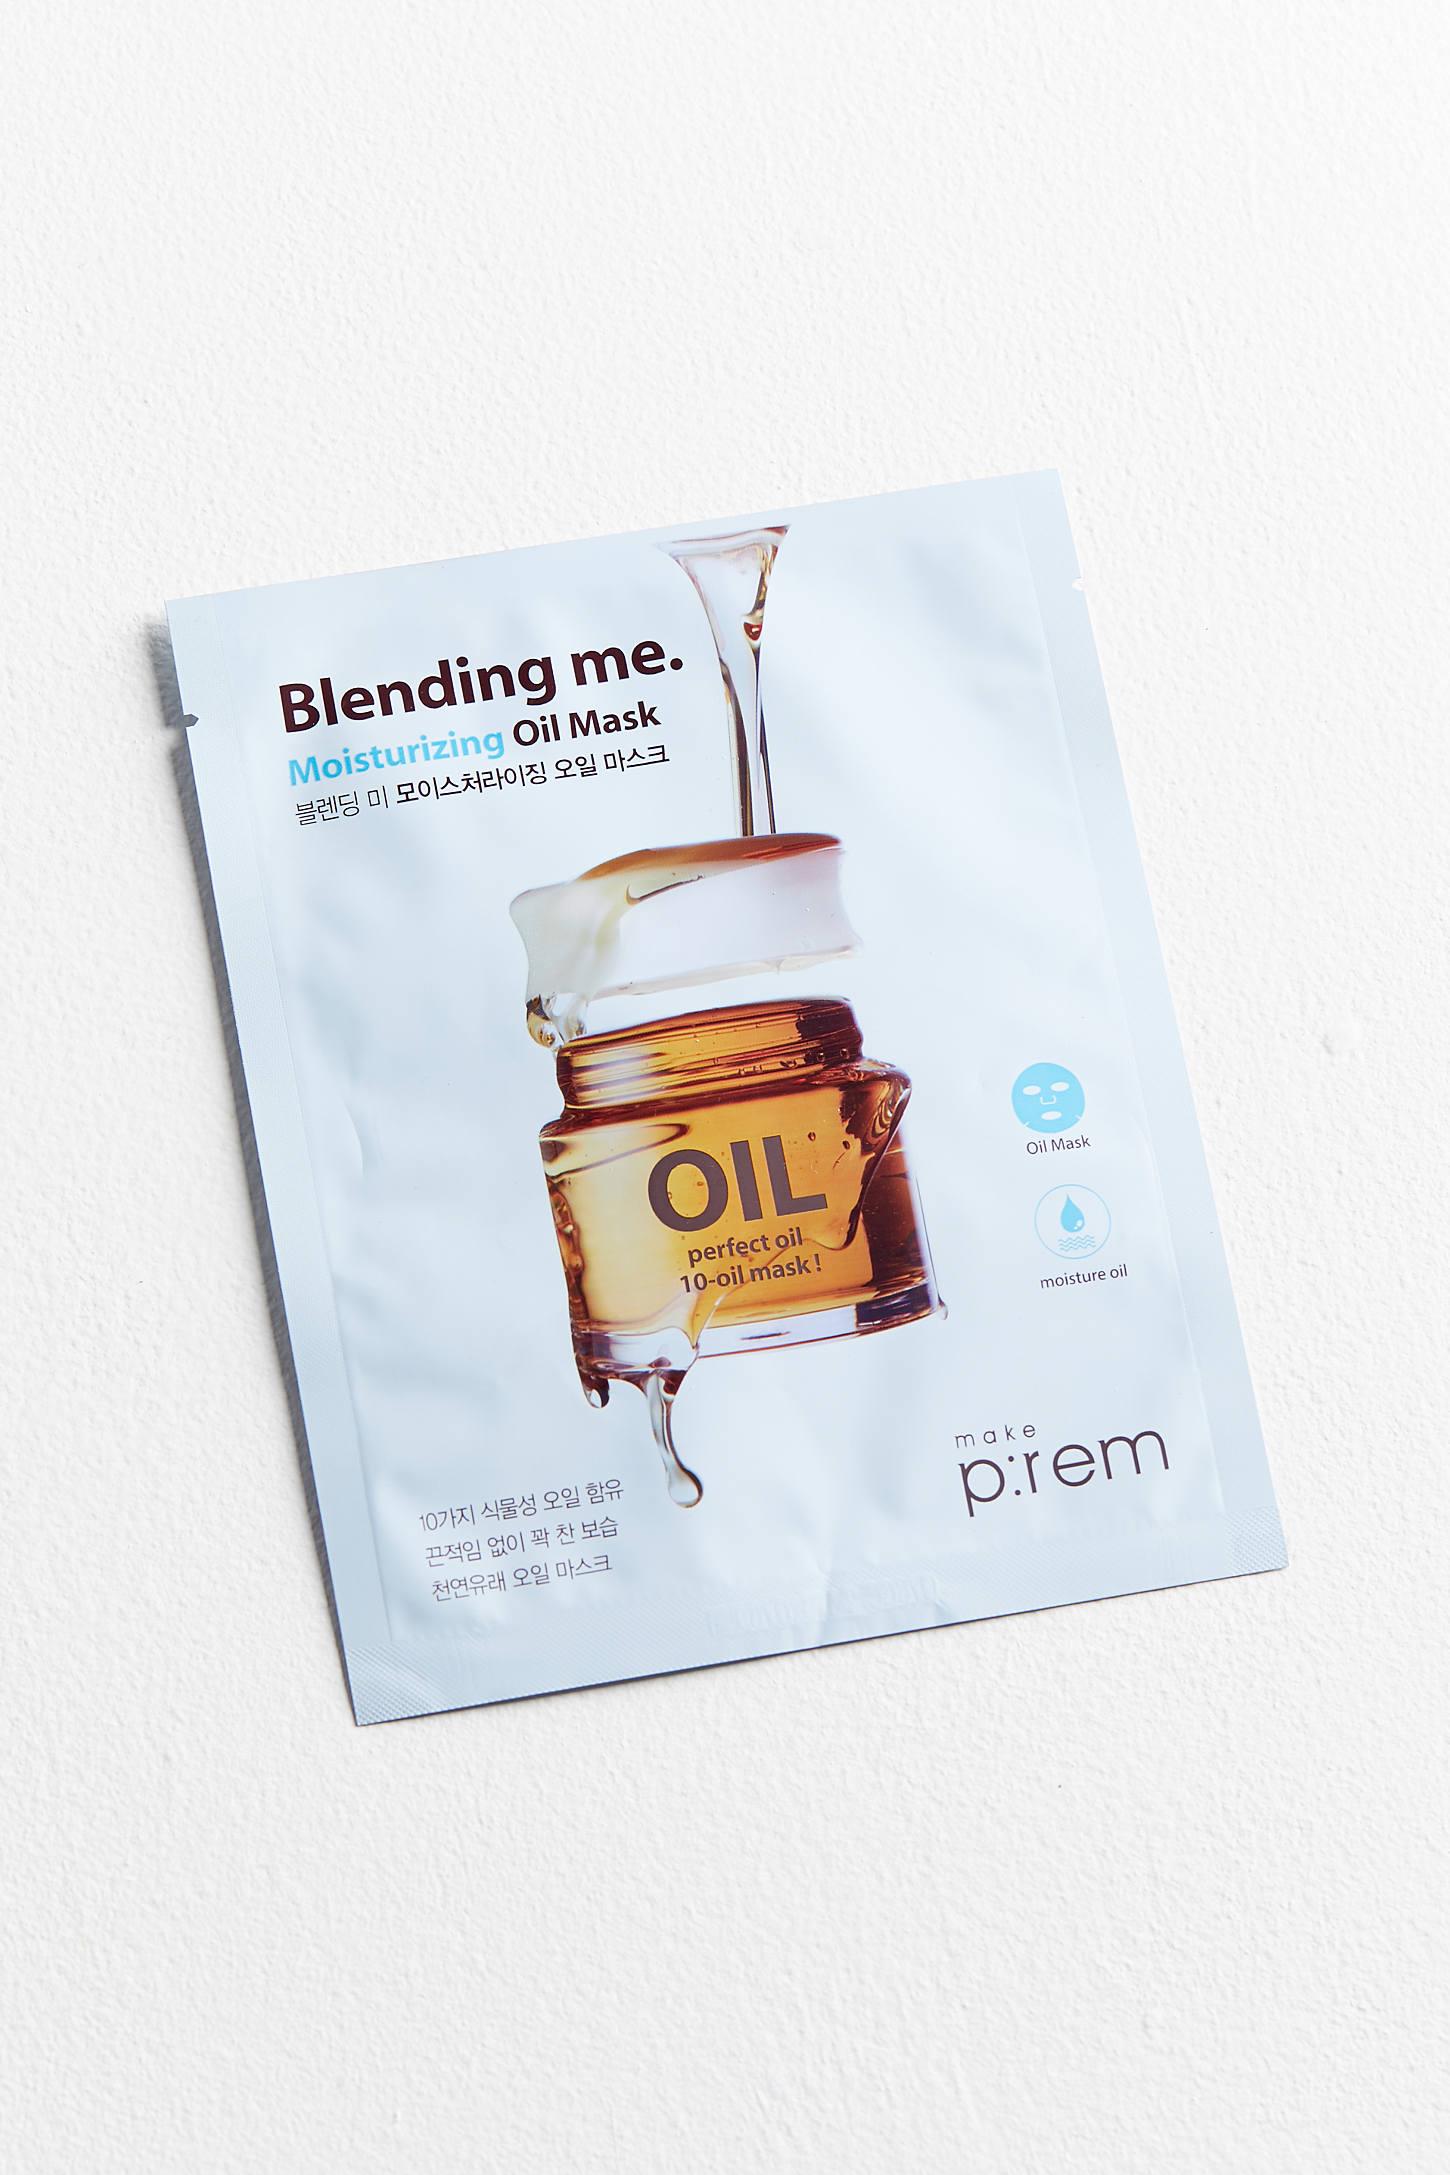 Make P:rem - Blending Me. Moisturizing Oil Sheet Mask